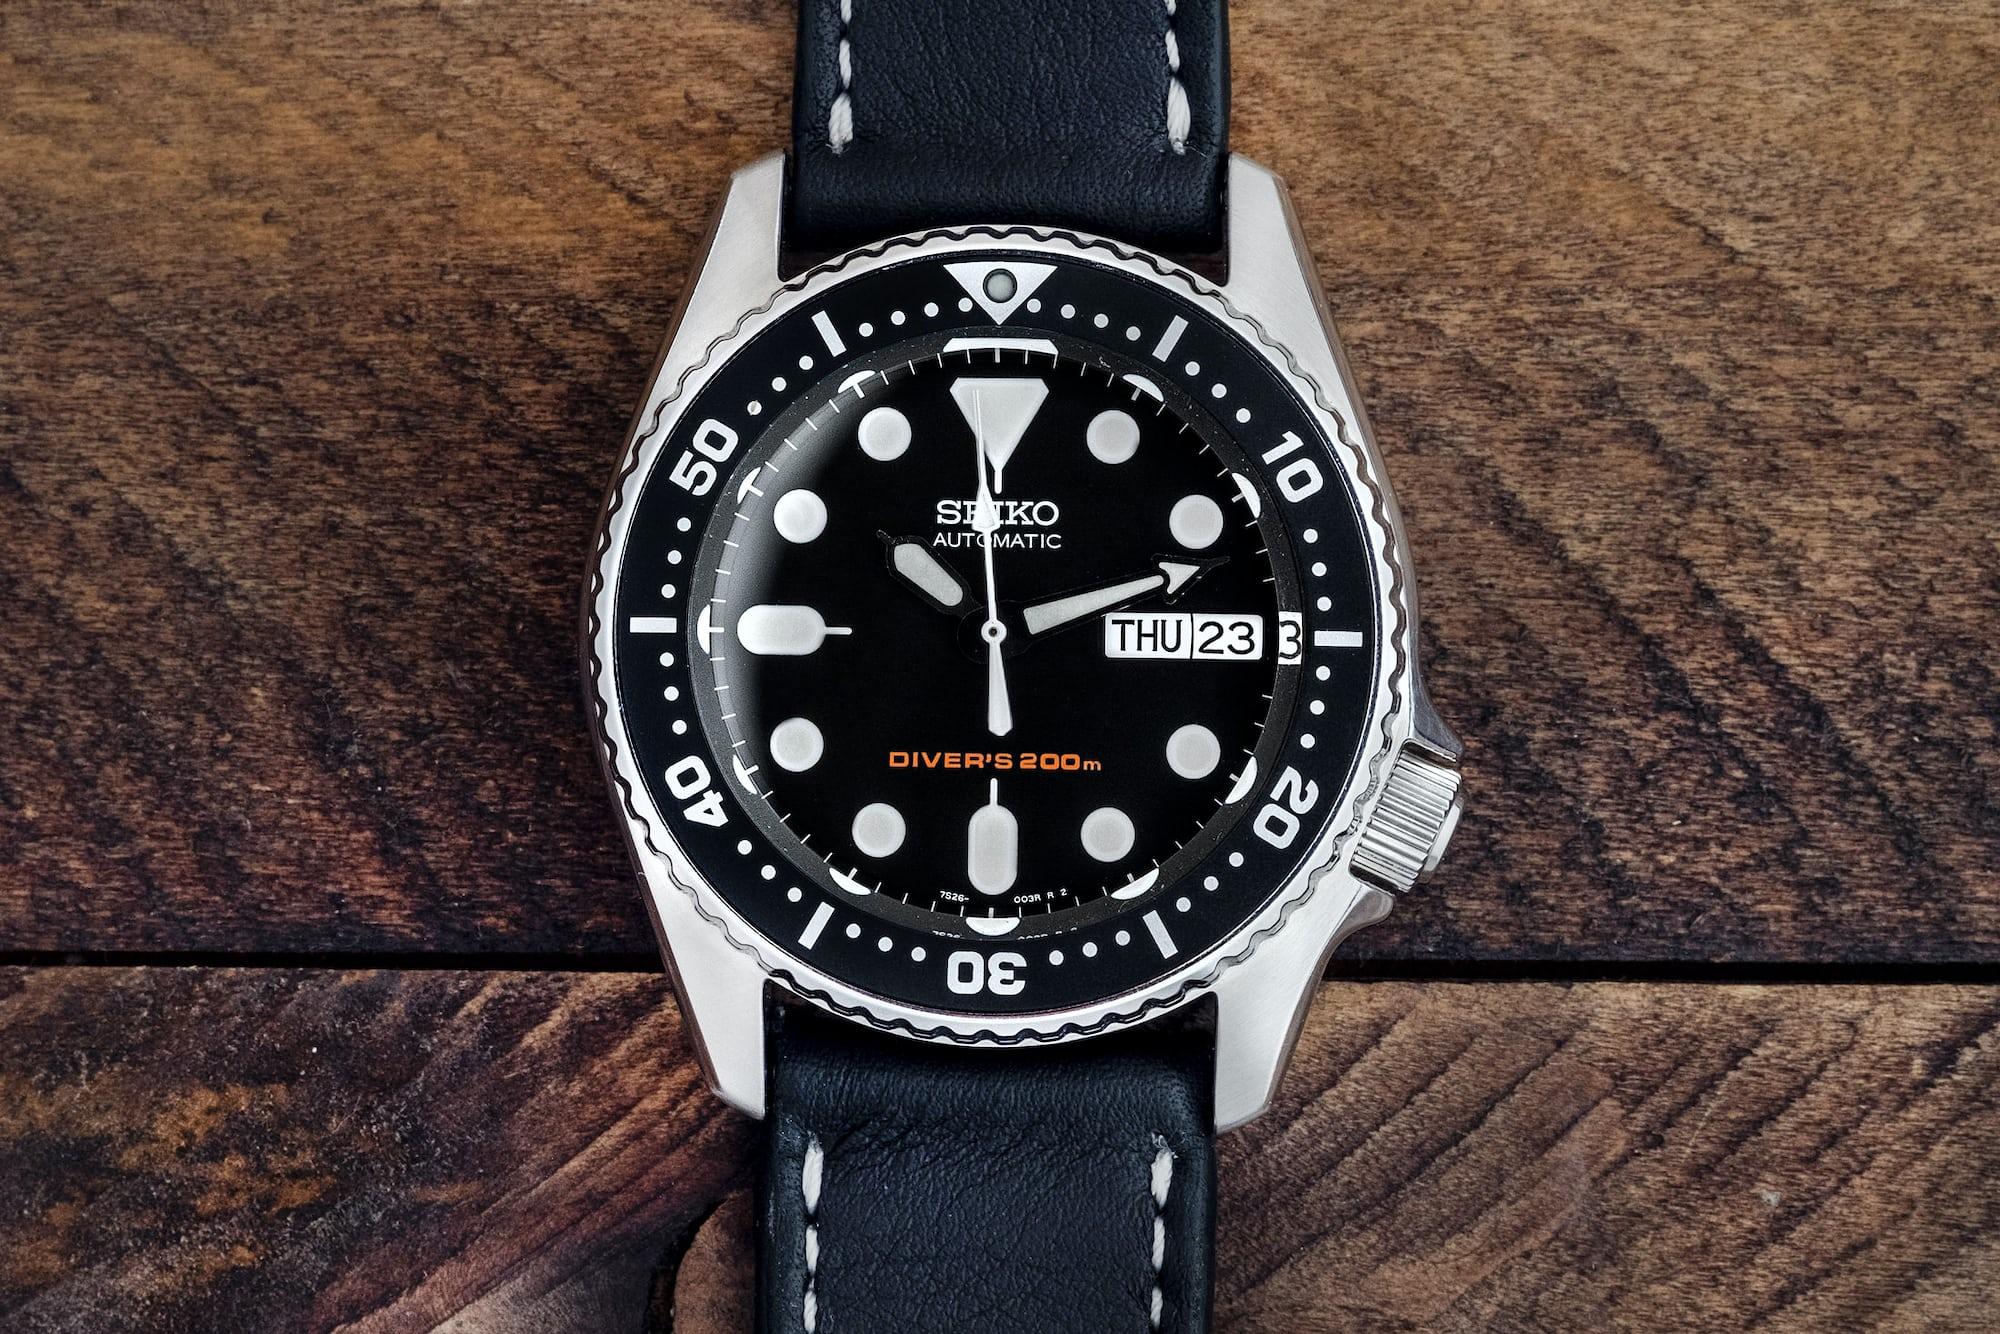 The Value Proposition: The Seiko SKX013 Dive Watch DSCF9126